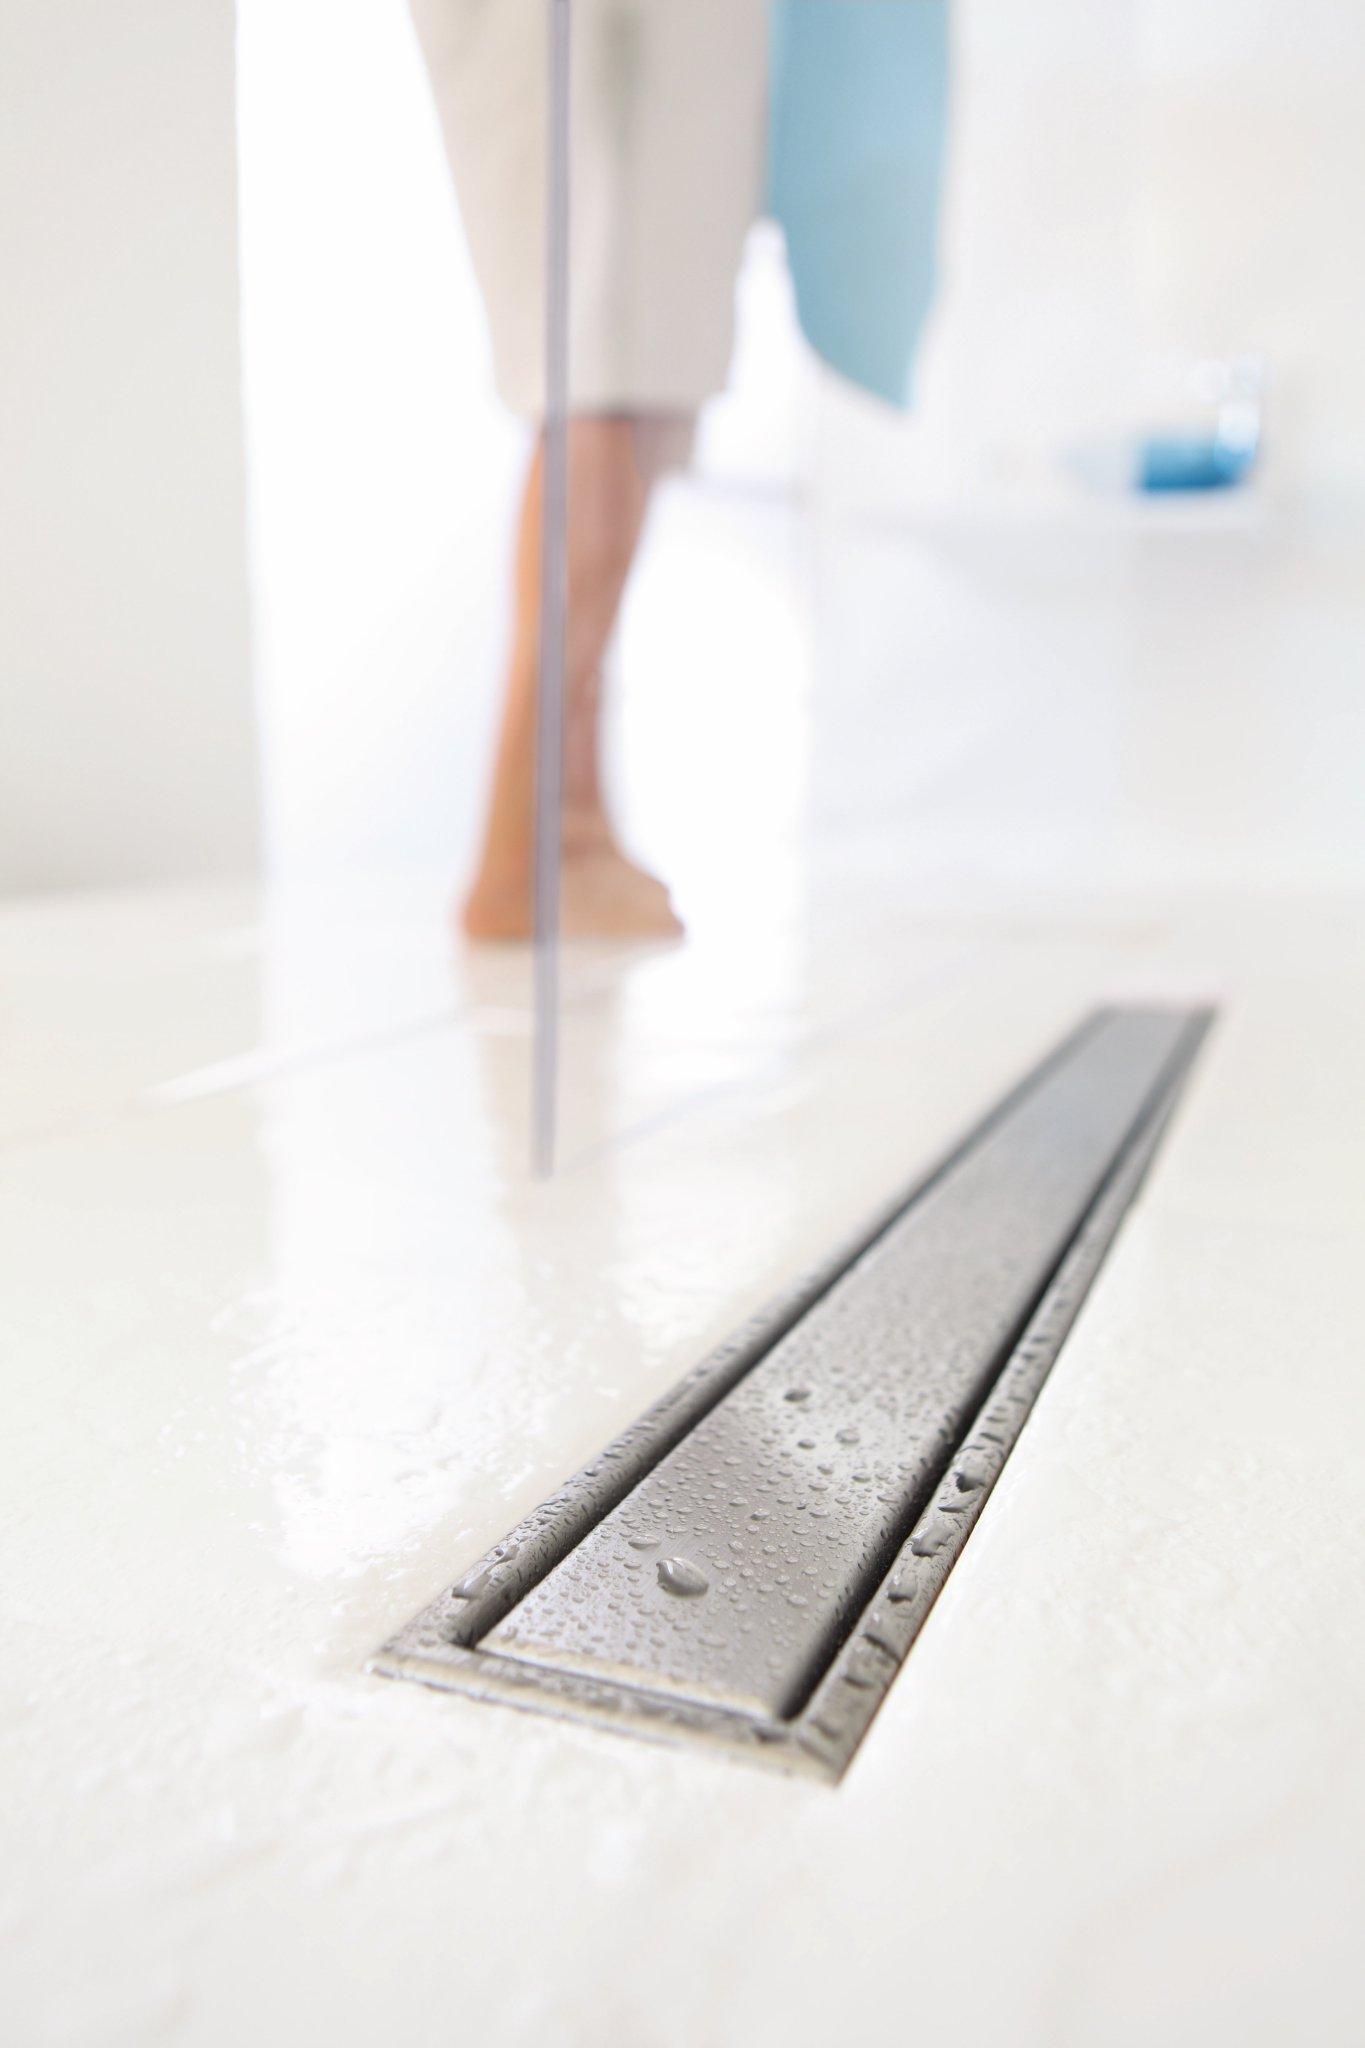 wetroom waste - Bathroom Cladding In Wetrooms